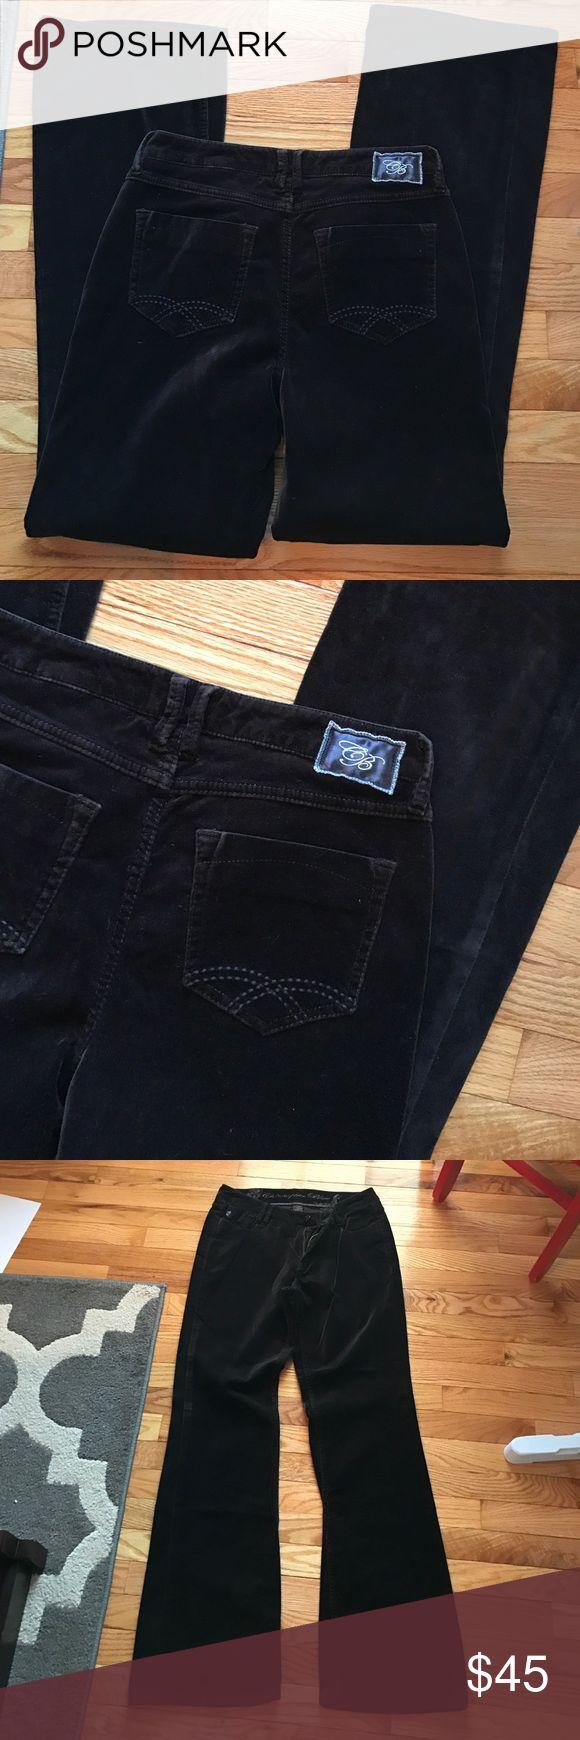 Christopher Blue dark brown velvet pants size 8 VGUC smoke free home. Cotton spandex blend Christopher Blue Pants Trousers